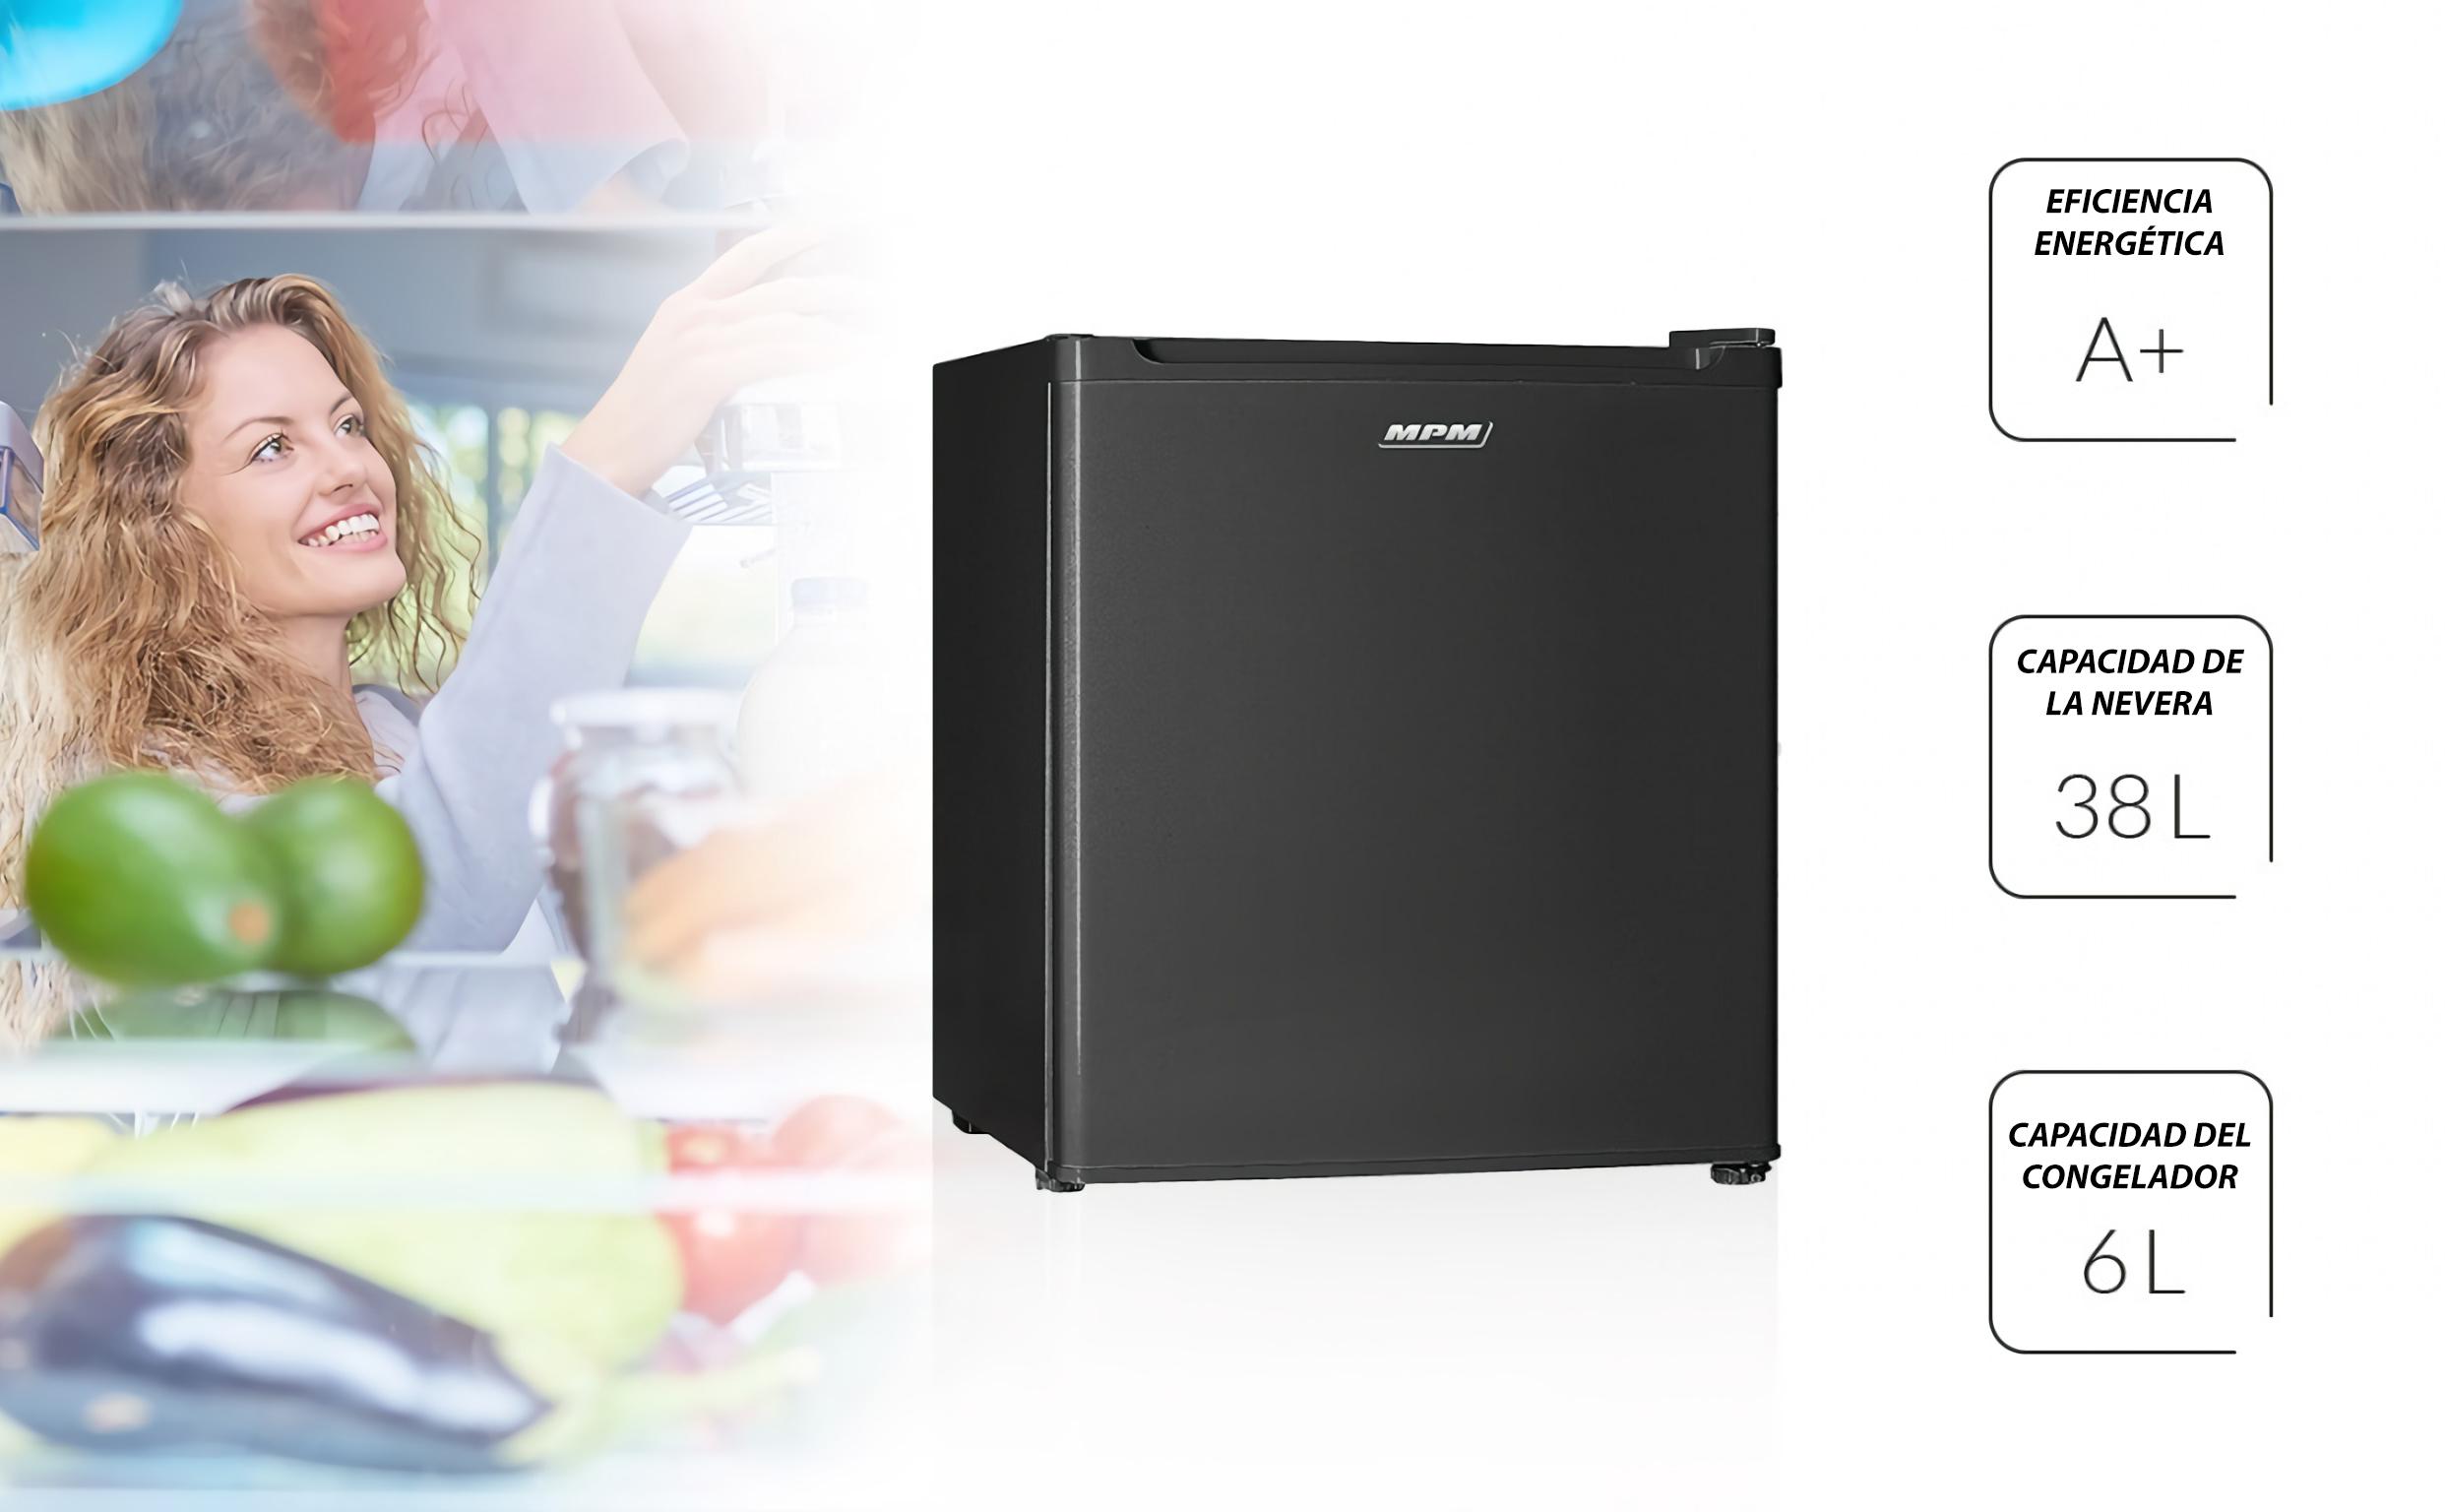 MPM 46-CJ02-A Mini Frigorífico con Congelador 5 L, 46 Litros, Silencioso, Regulador de Potencia, Reversible, Eficiencia A+, 85W